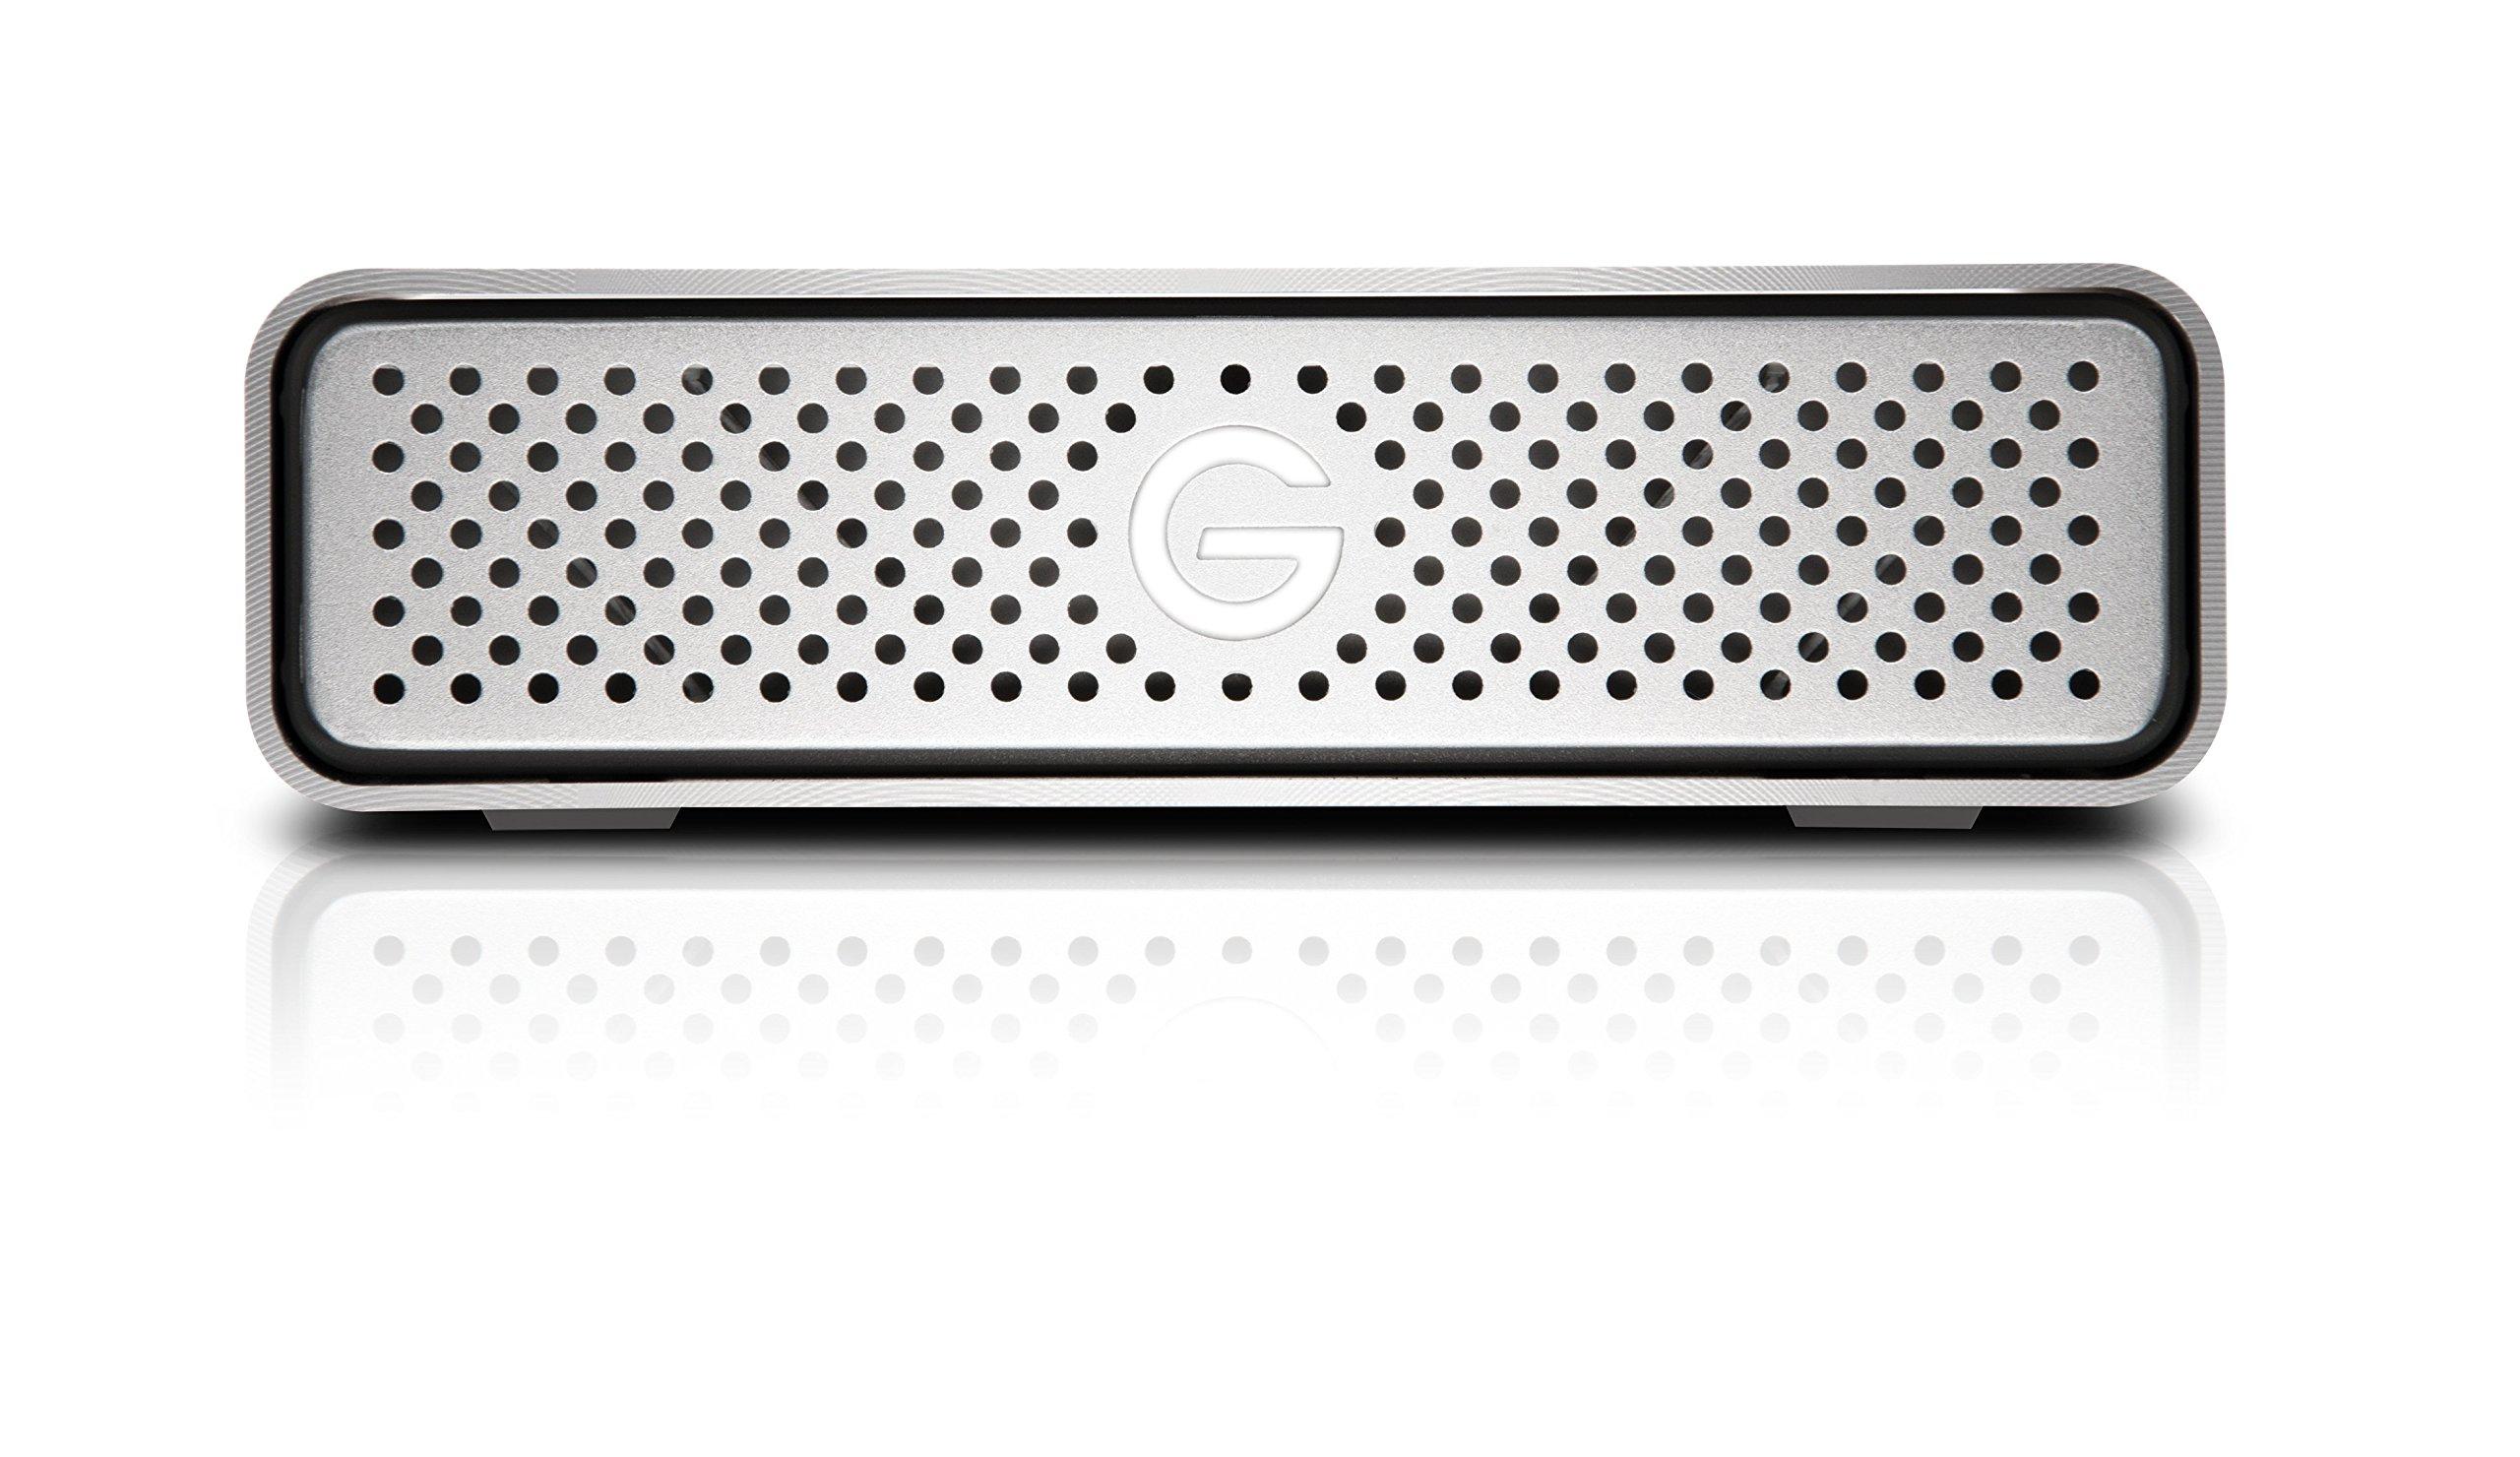 G-Technology G-DRIVE USB-C External Drive 4TB 0G05666 by G-Technology (Image #2)